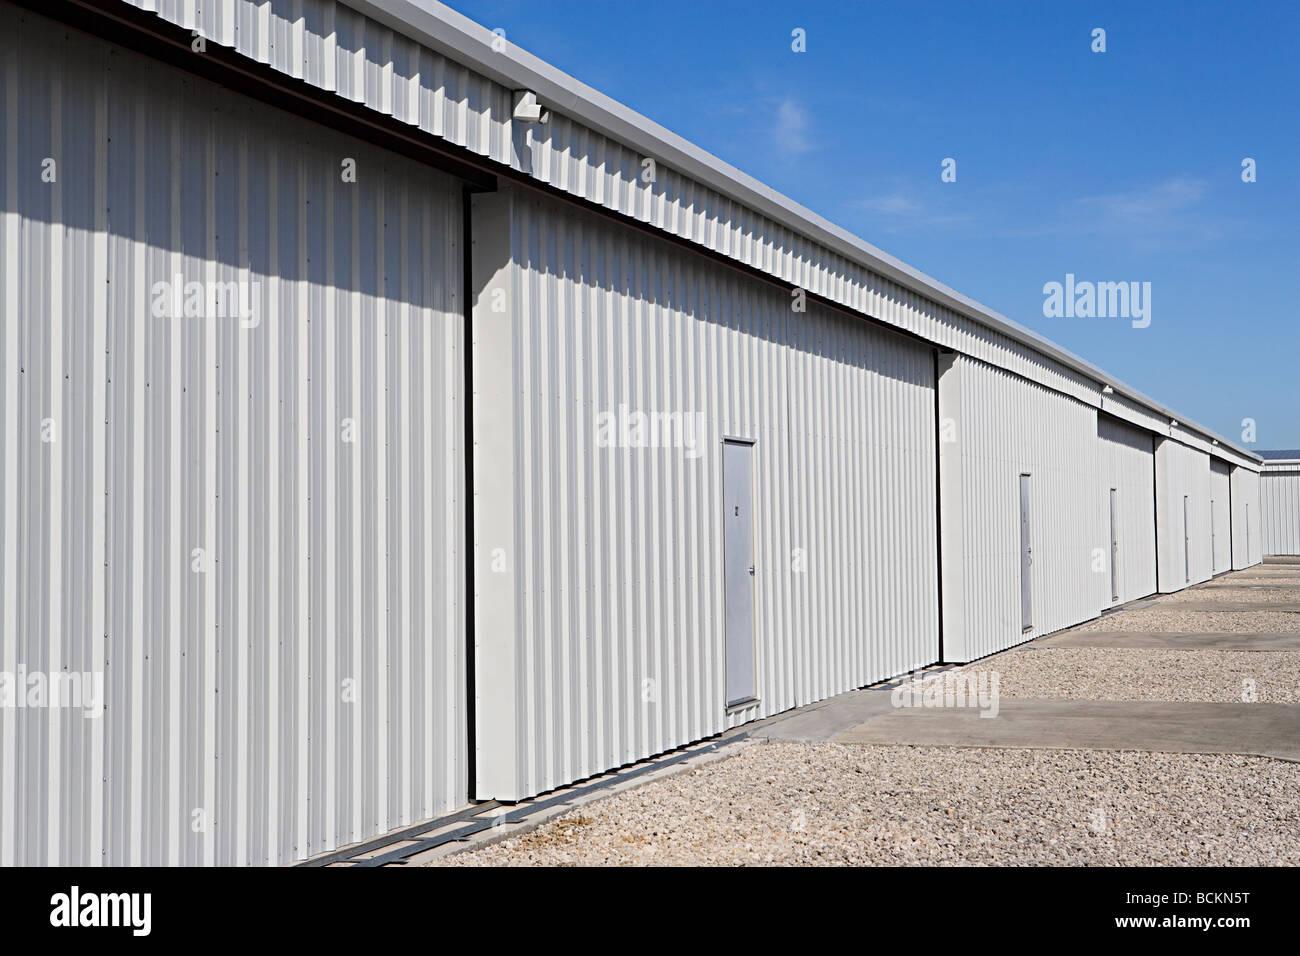 Warehouse buildings - Stock Image